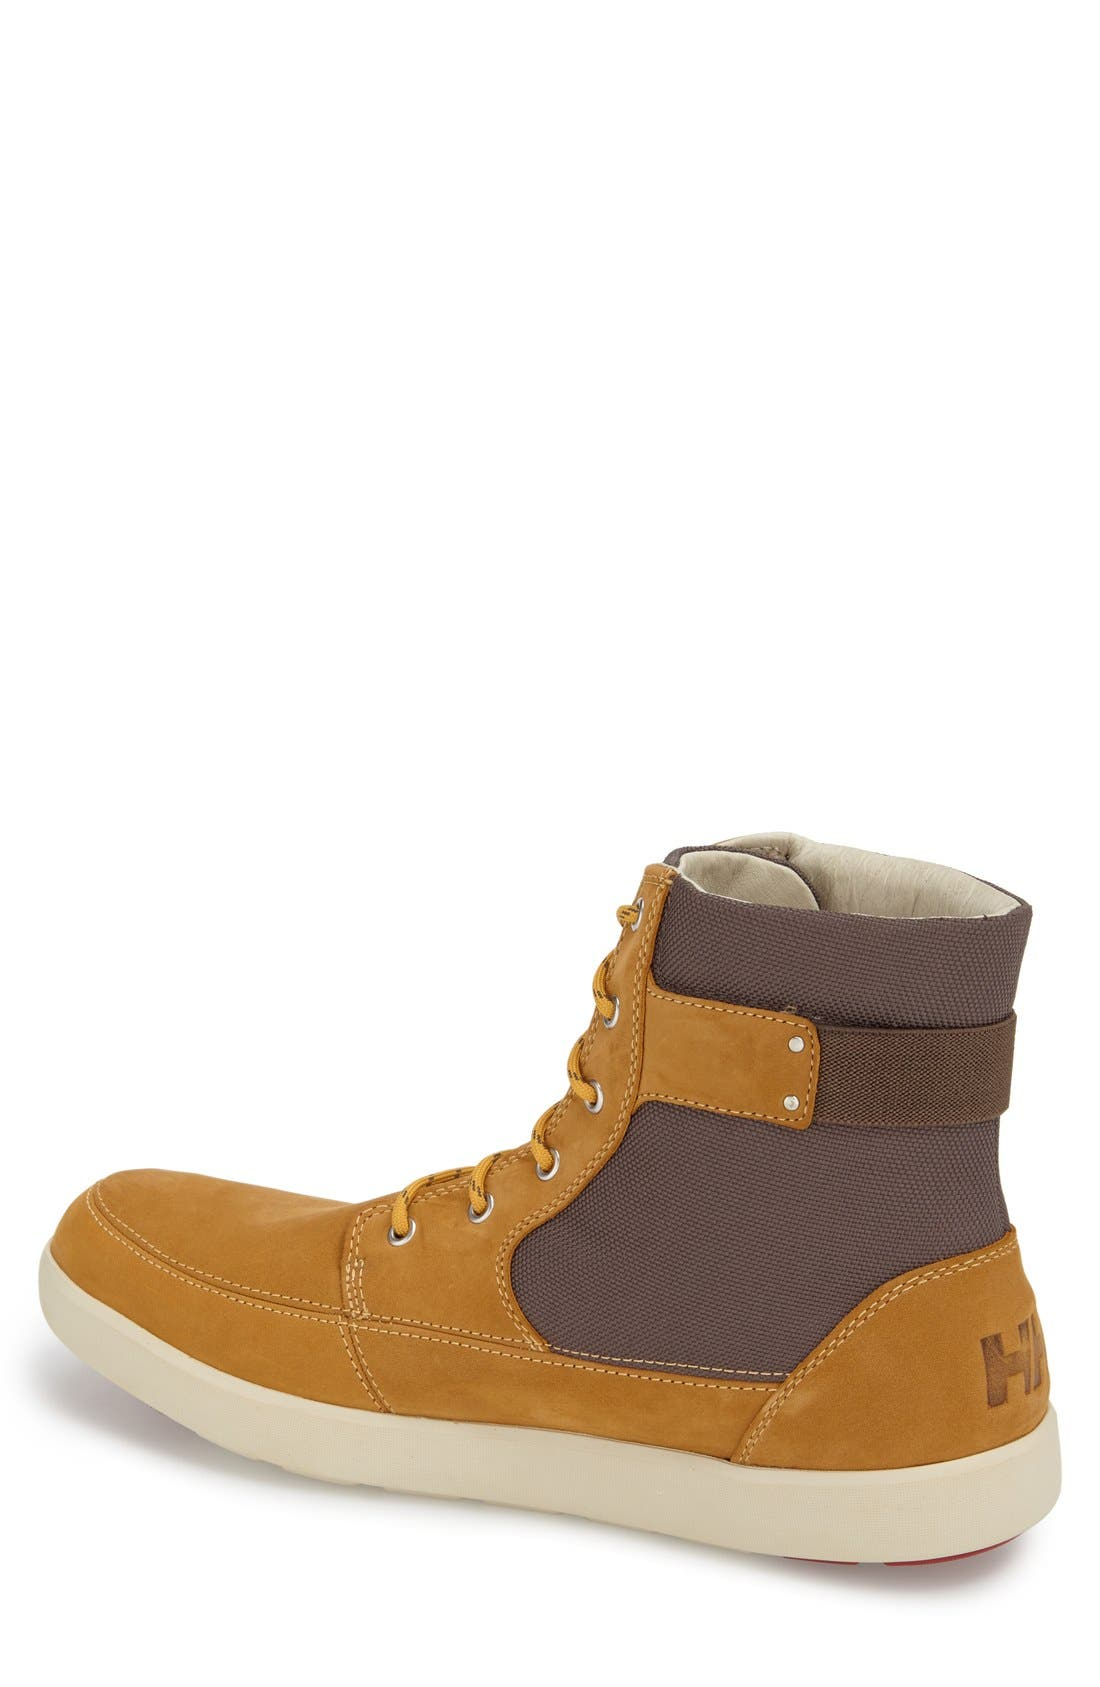 'Stockholm' Waterproof High Top Sneaker,                             Alternate thumbnail 12, color,